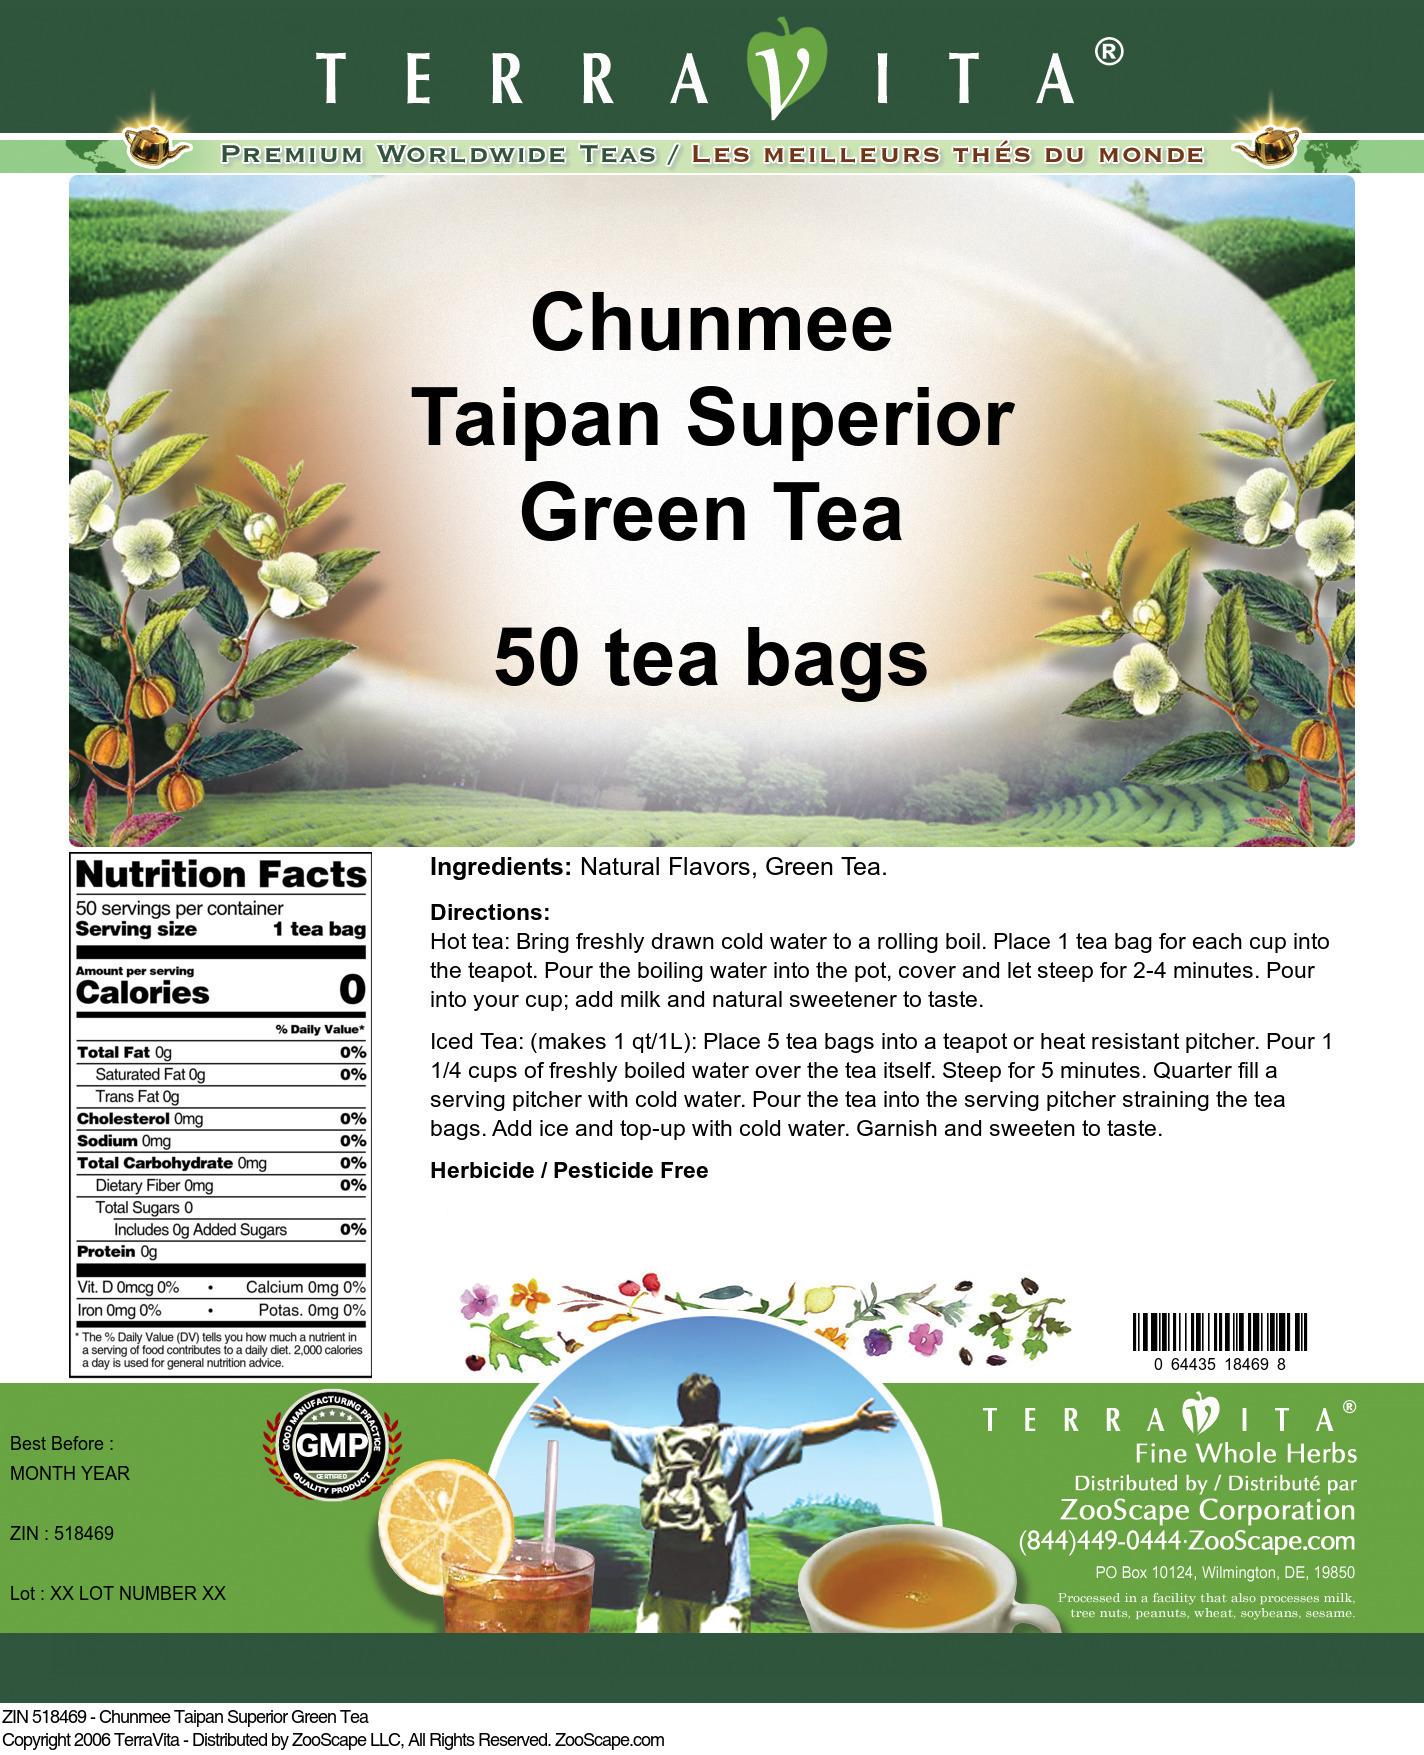 Chunmee Taipan Superior Green